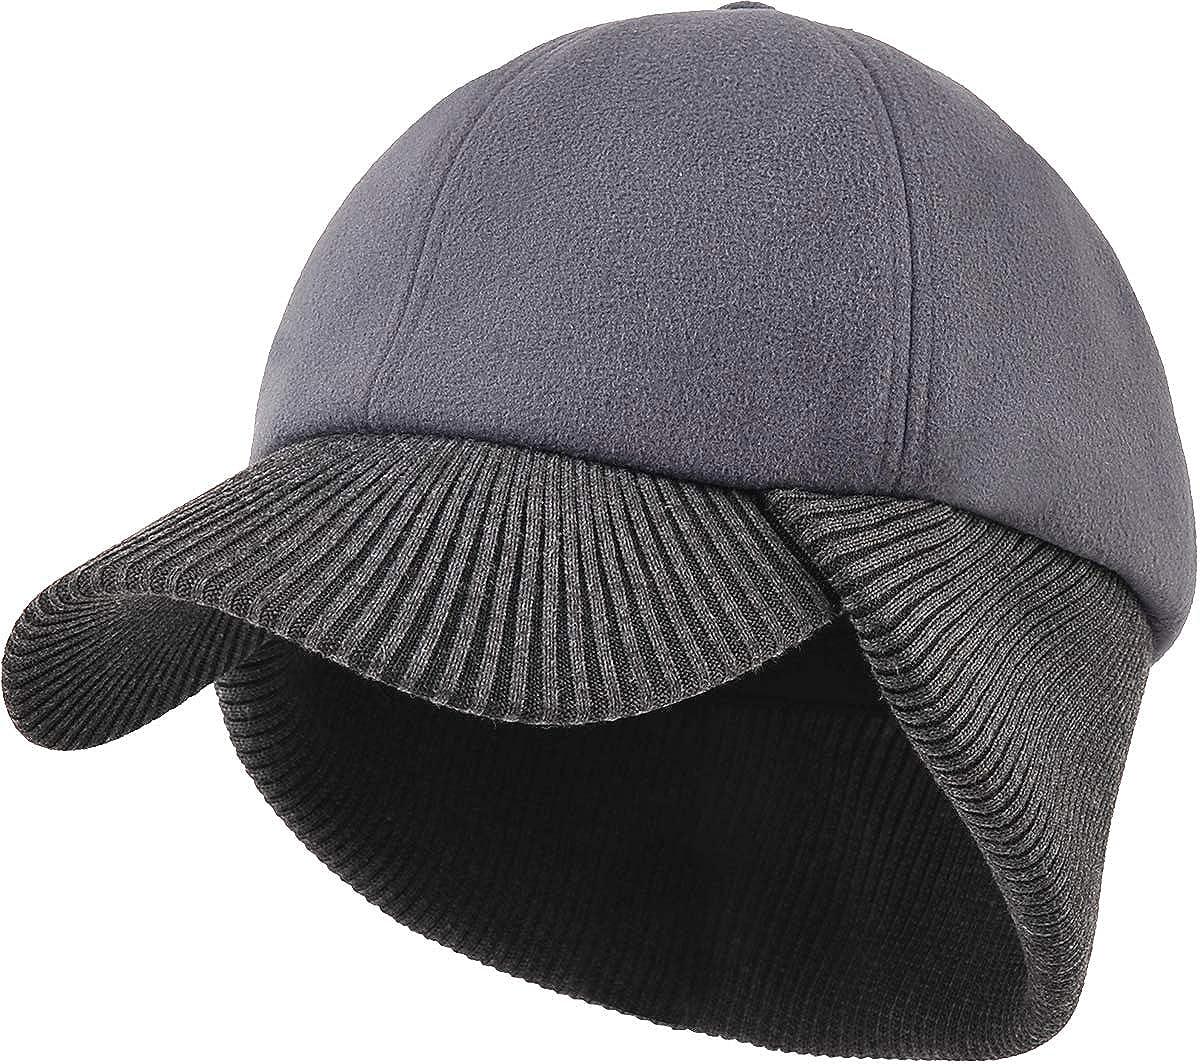 New arrival LCZTN Wool Winter Baseball Excellence Cap with Earflap Men Warmer for ï¼Â